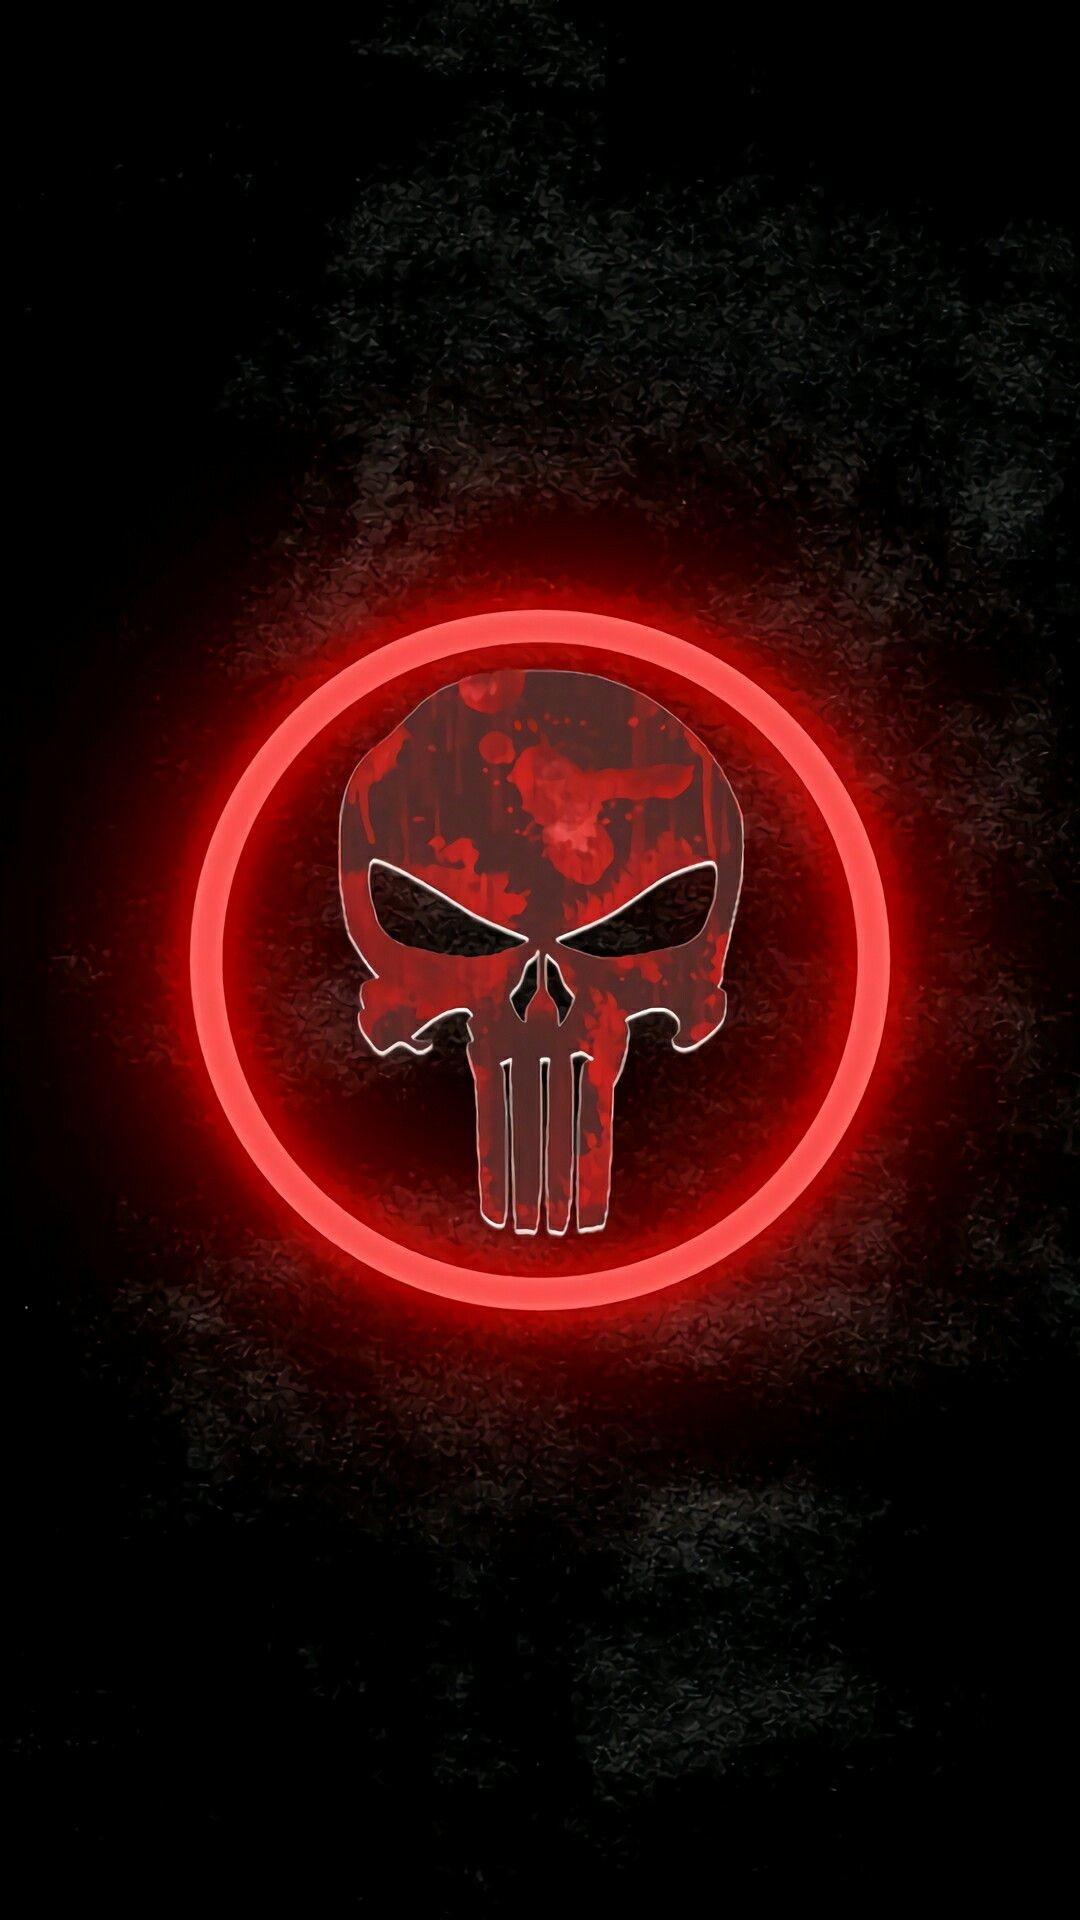 Punisher Skull Iphone Wallpaper 82 Images